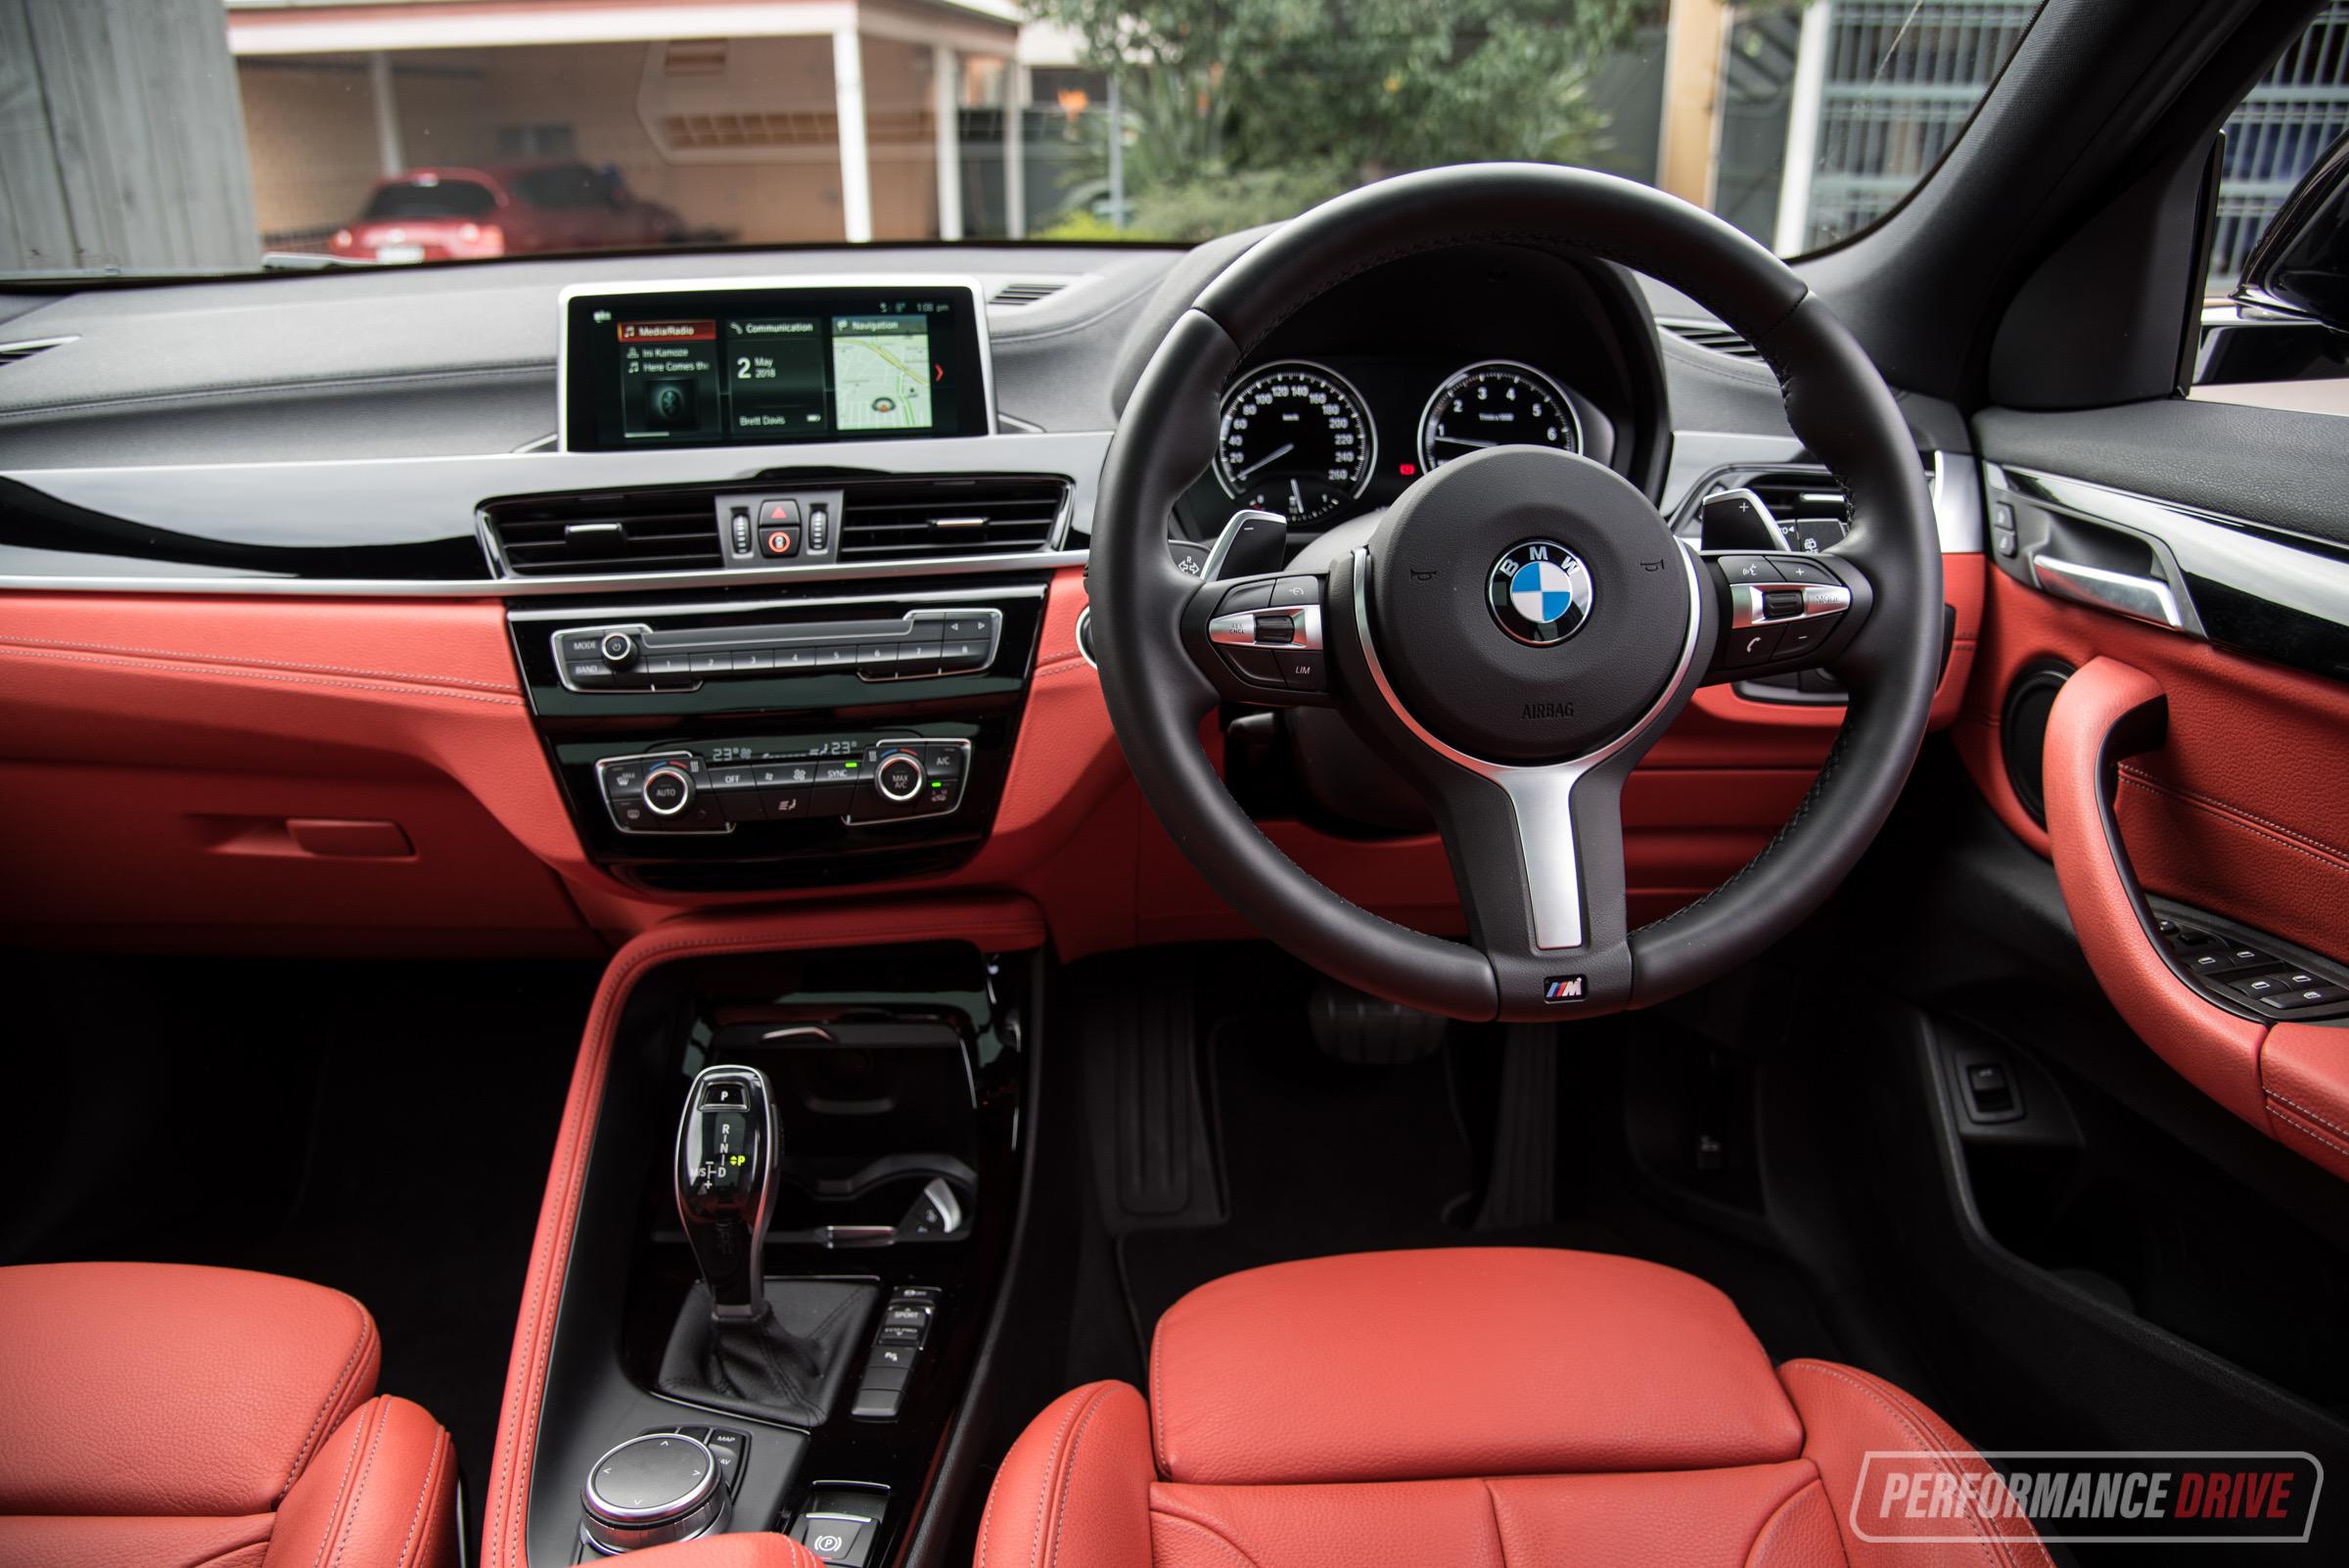 2018 Bmw X2 Sdrive20i M Sport Review Video Performancedrive